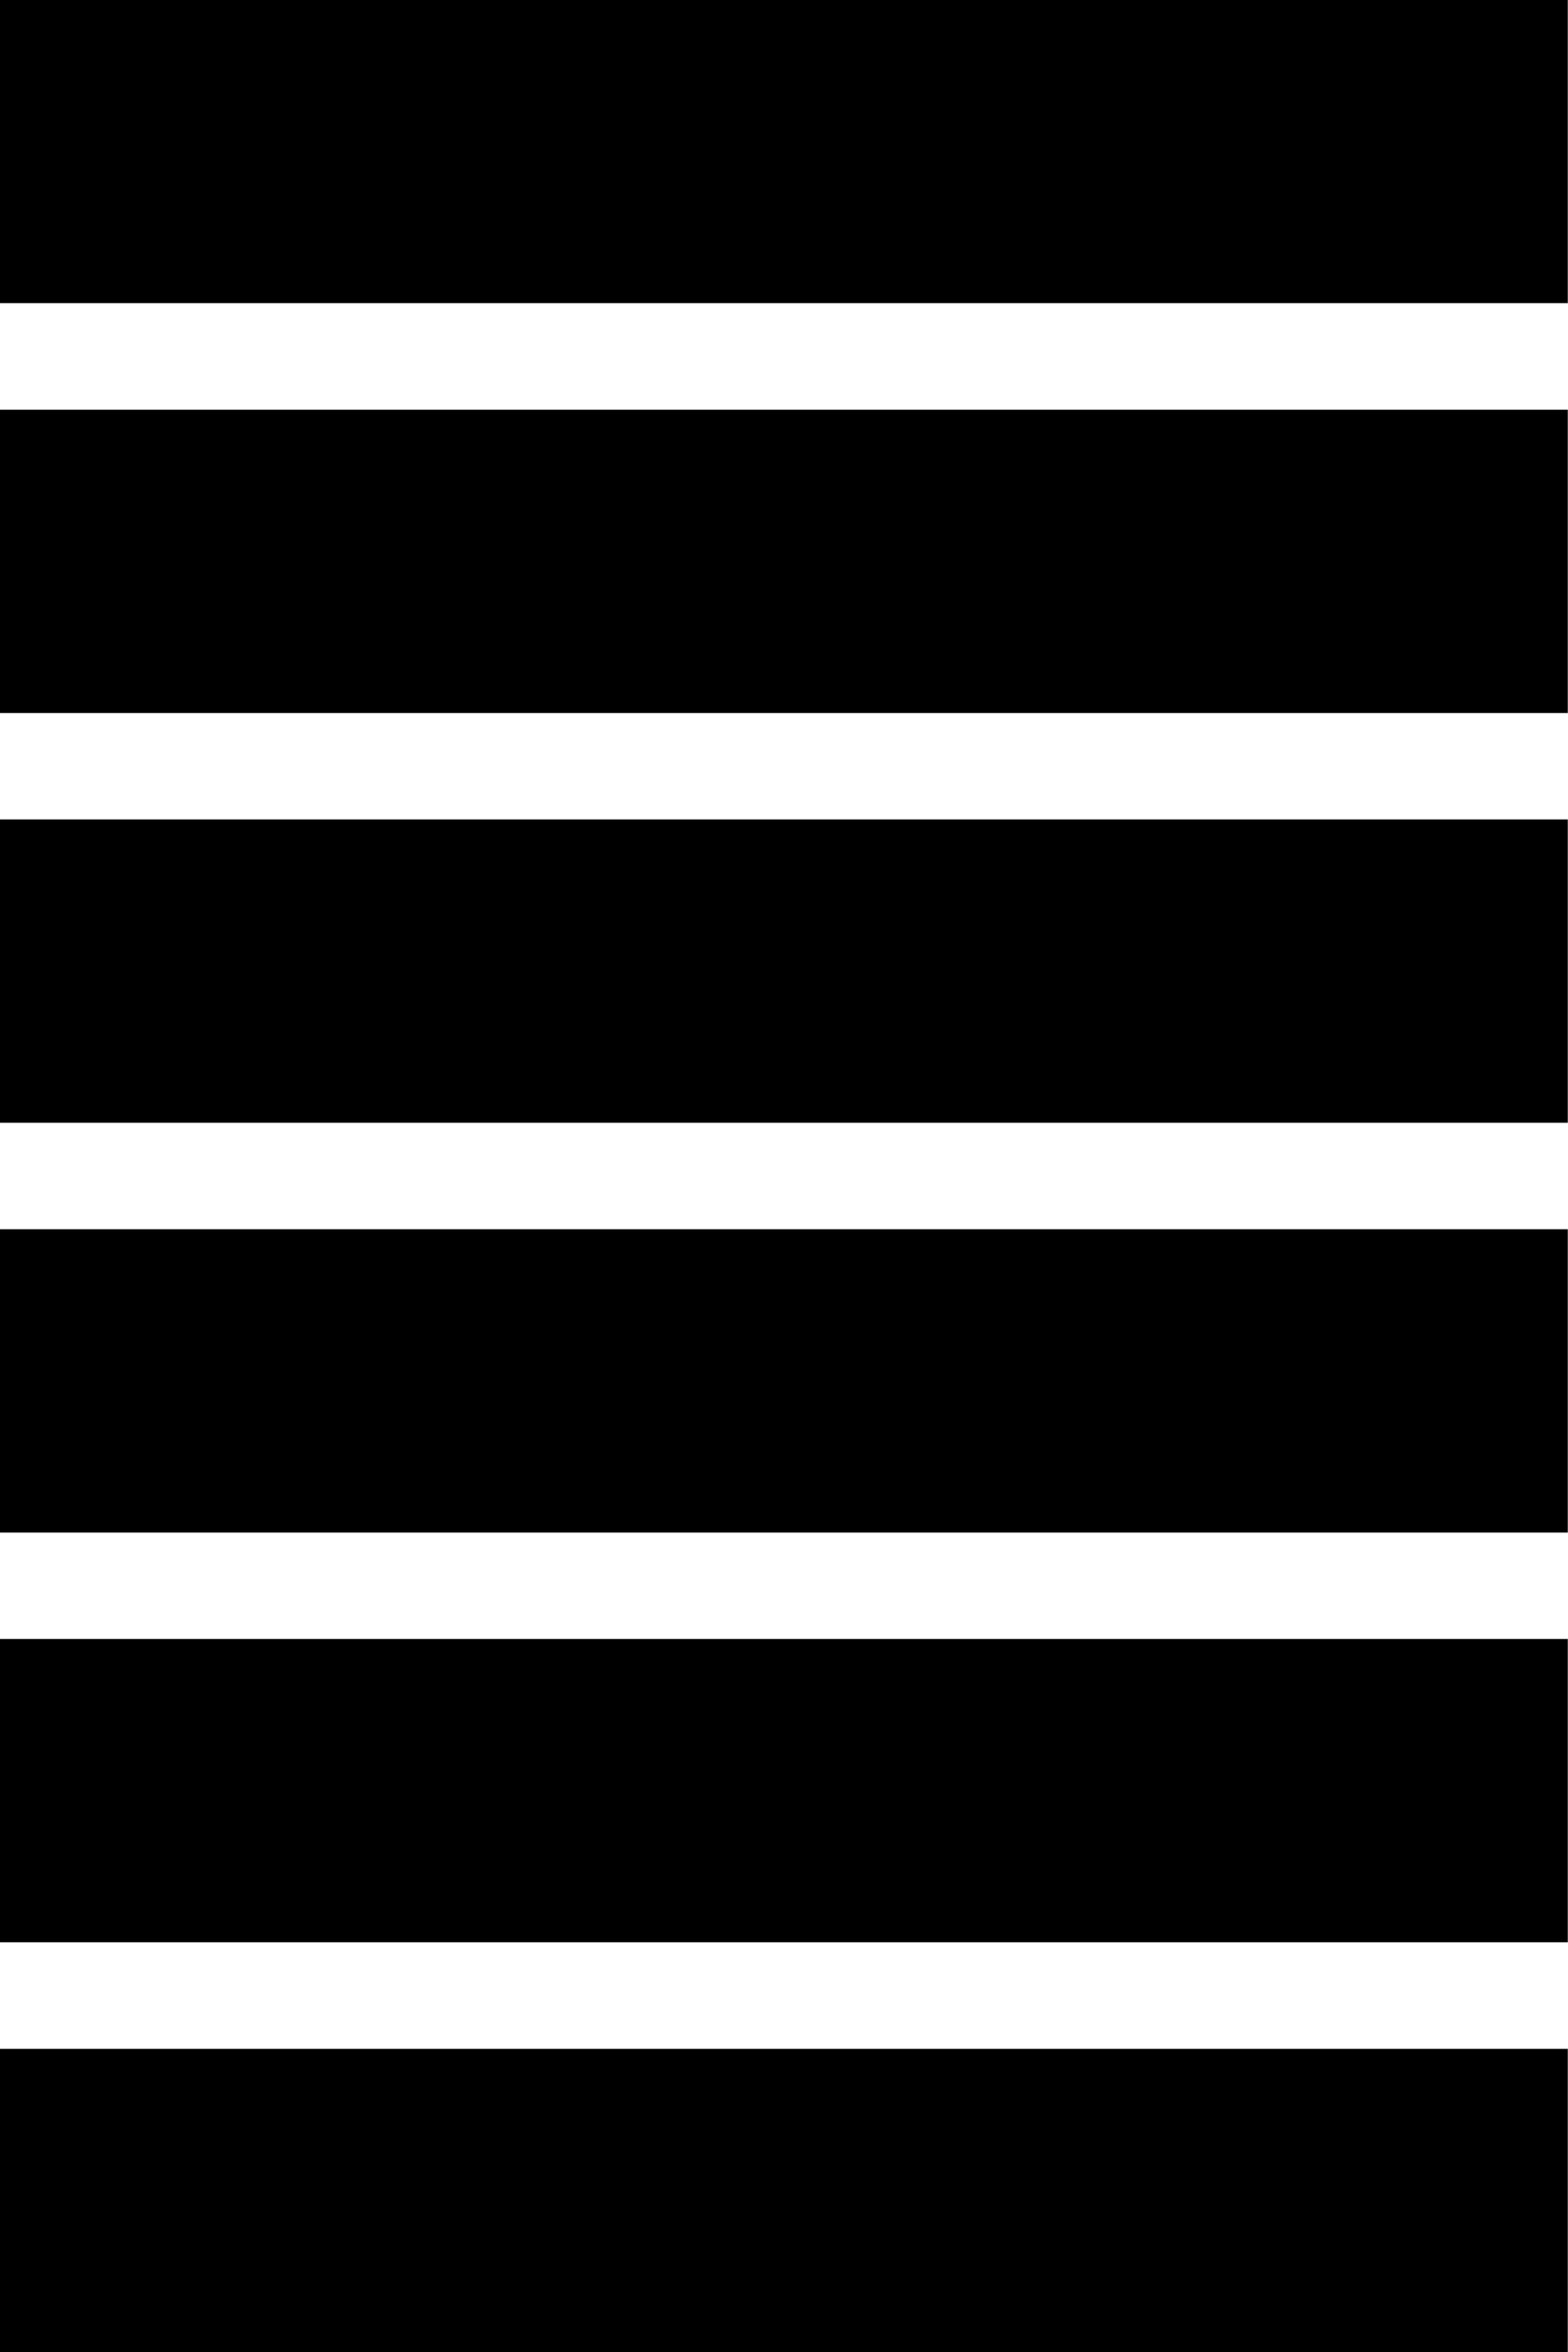 Wallpaper Background Design Striped Wallpaper Bold Stripes